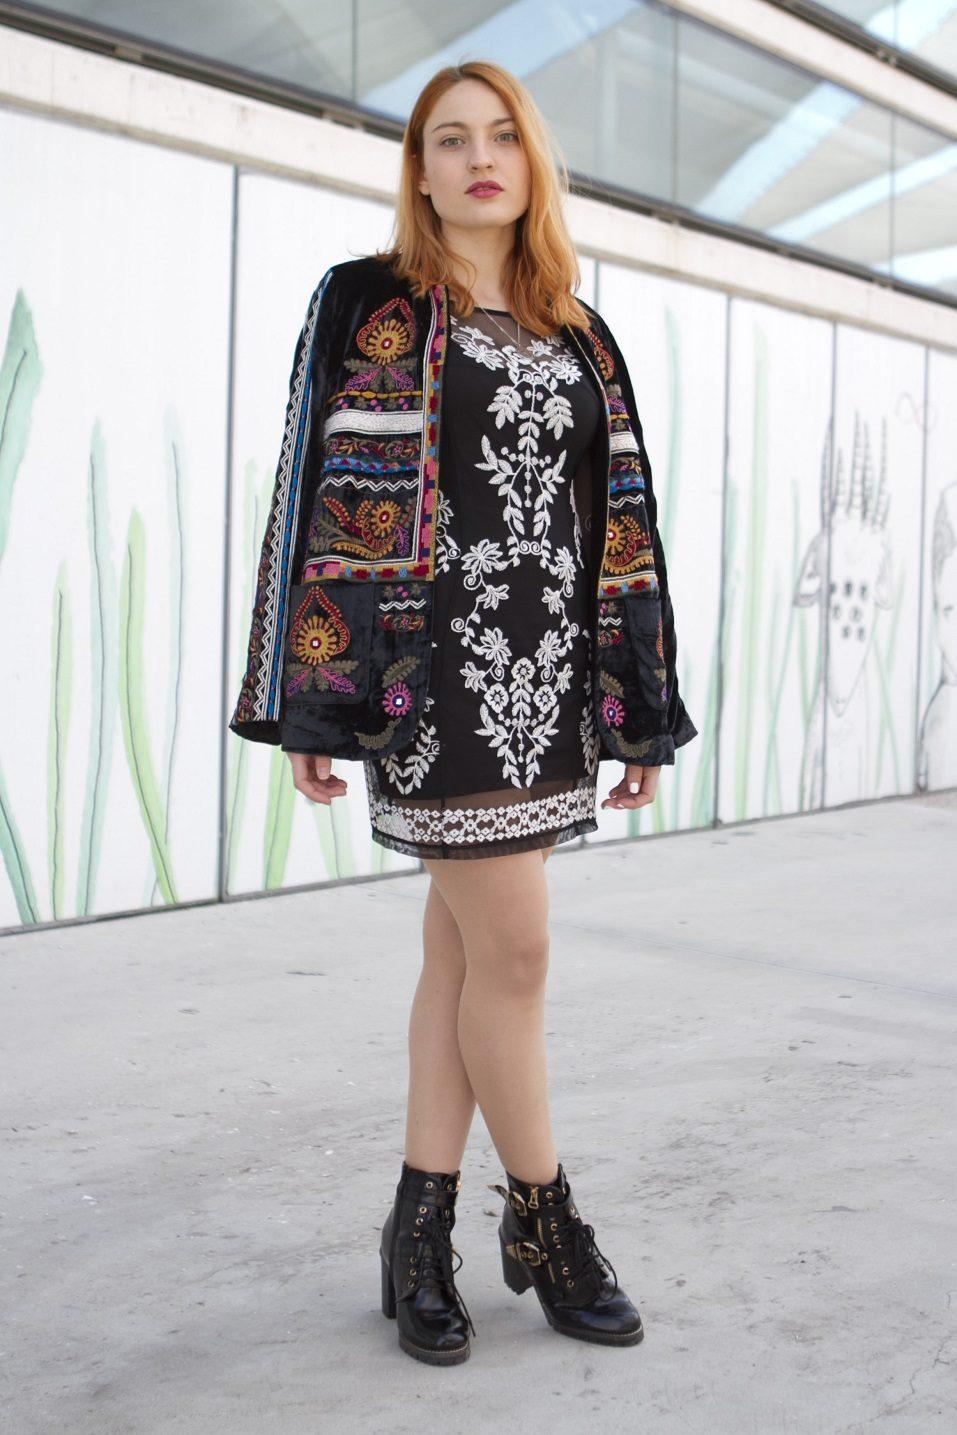 Alba Mirallo is wearing Vintage Boots